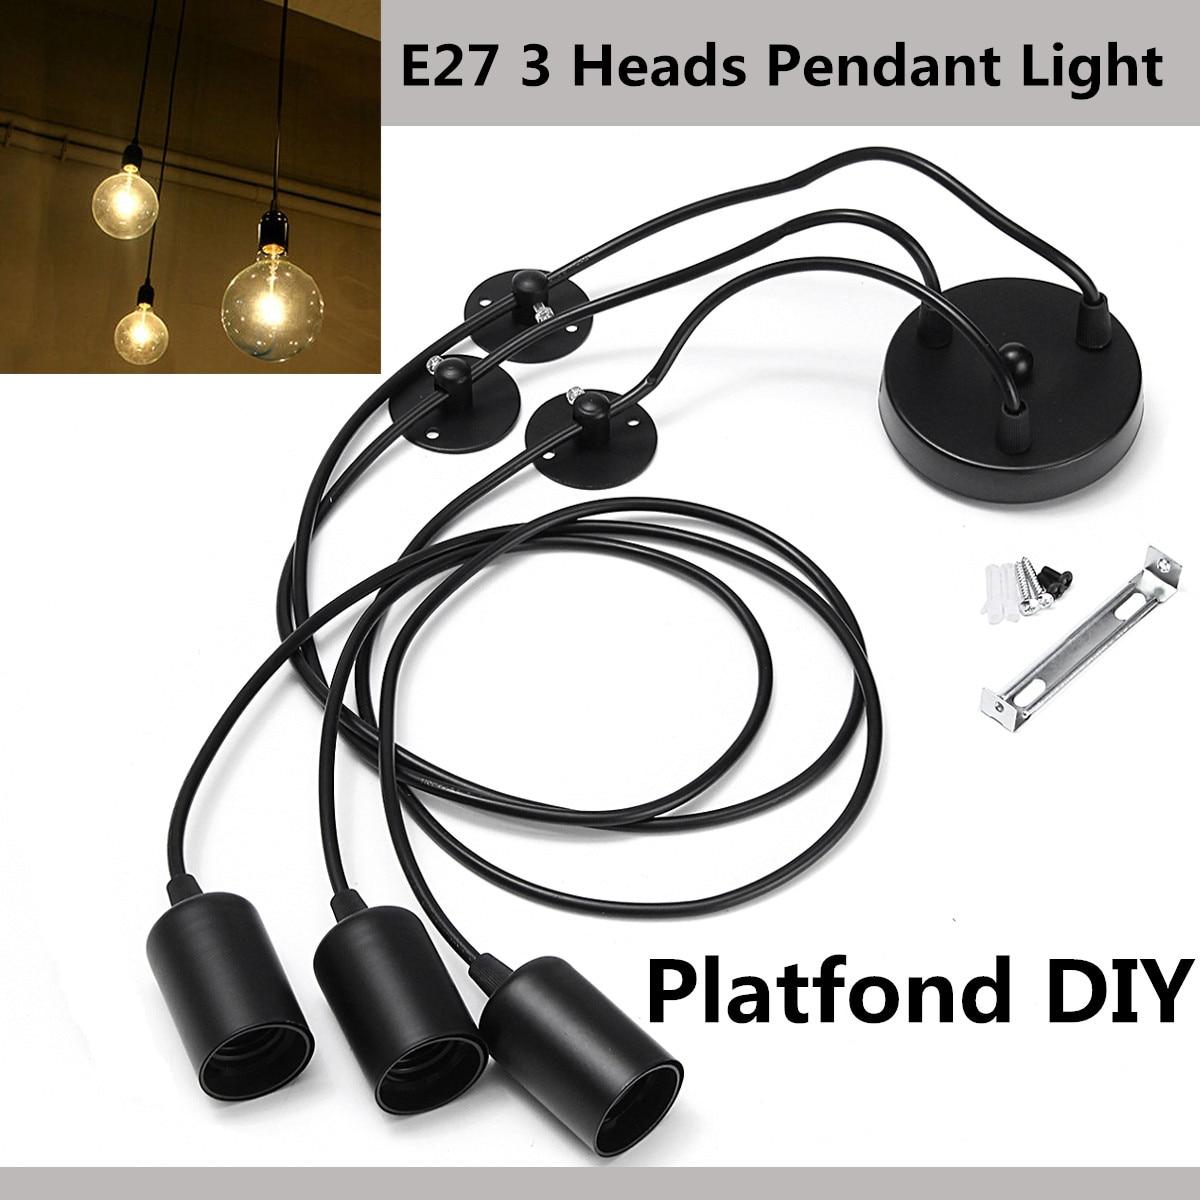 Mising Black E27 3 Heads Pendant Light Vintage Industrial Edison Ceiling Lamp Dining Lighting Retro Pendant Lamp